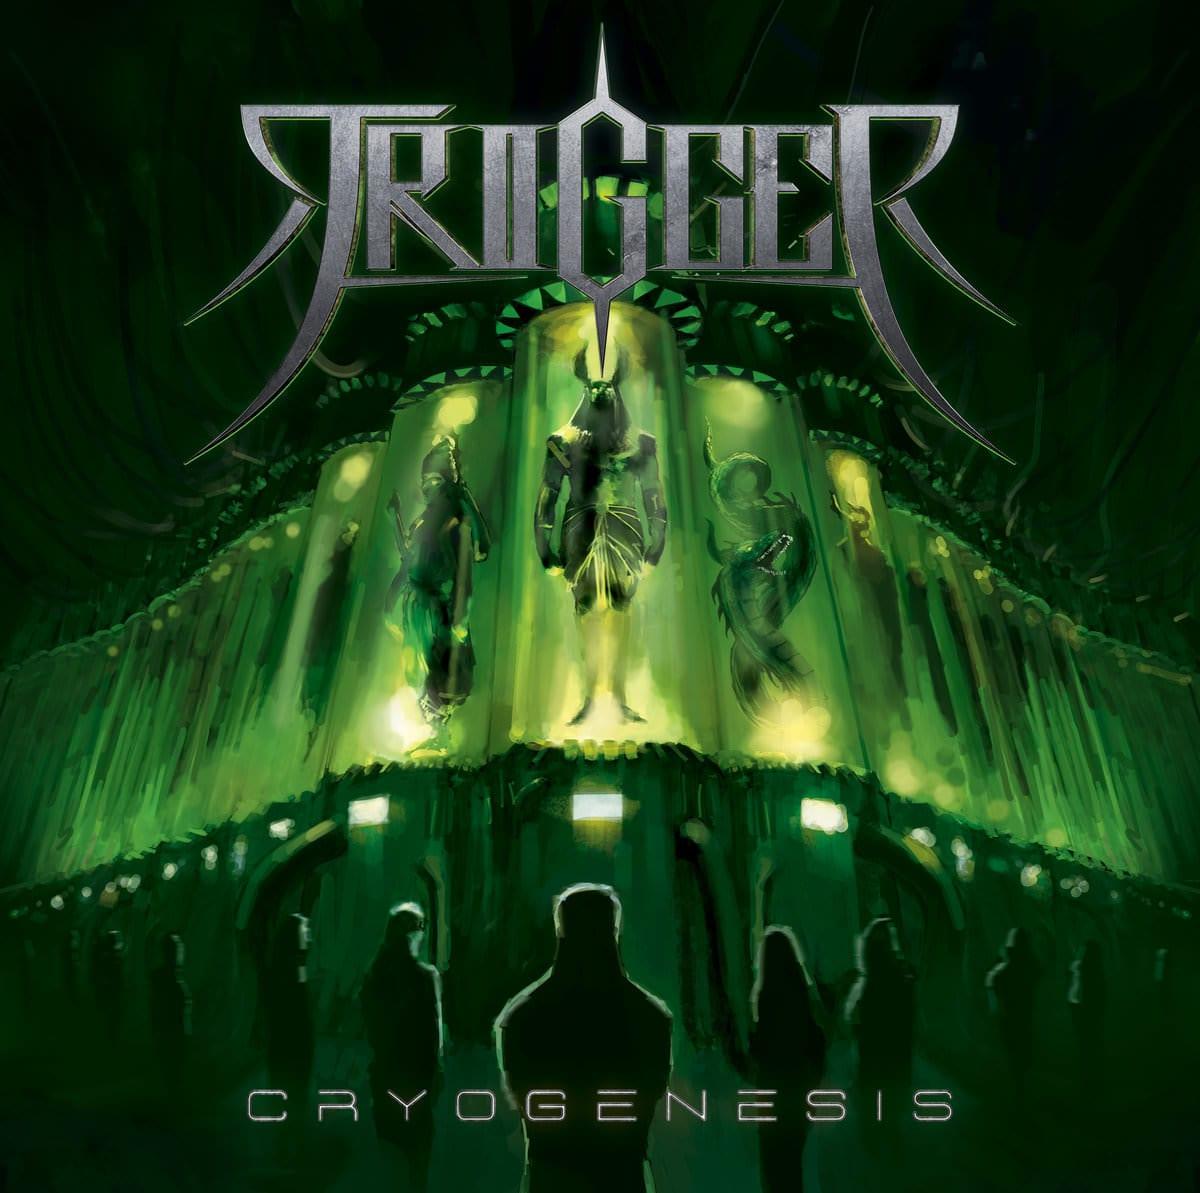 Trigger - CRYOGENESIS album cover